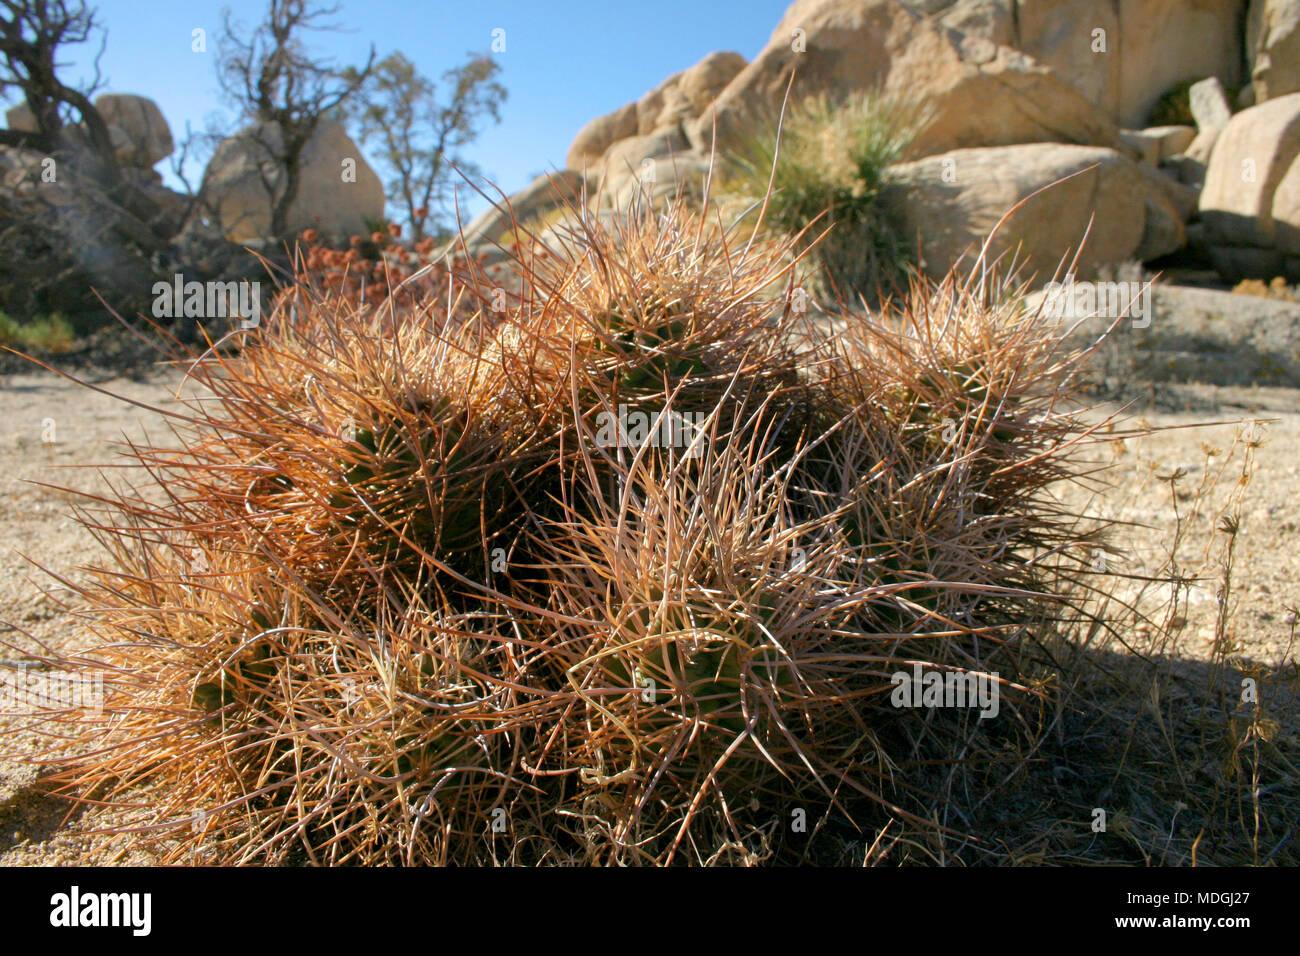 Cacti Echinocreus, Mojave Desert Joshua Tree National Park California Stock Photo